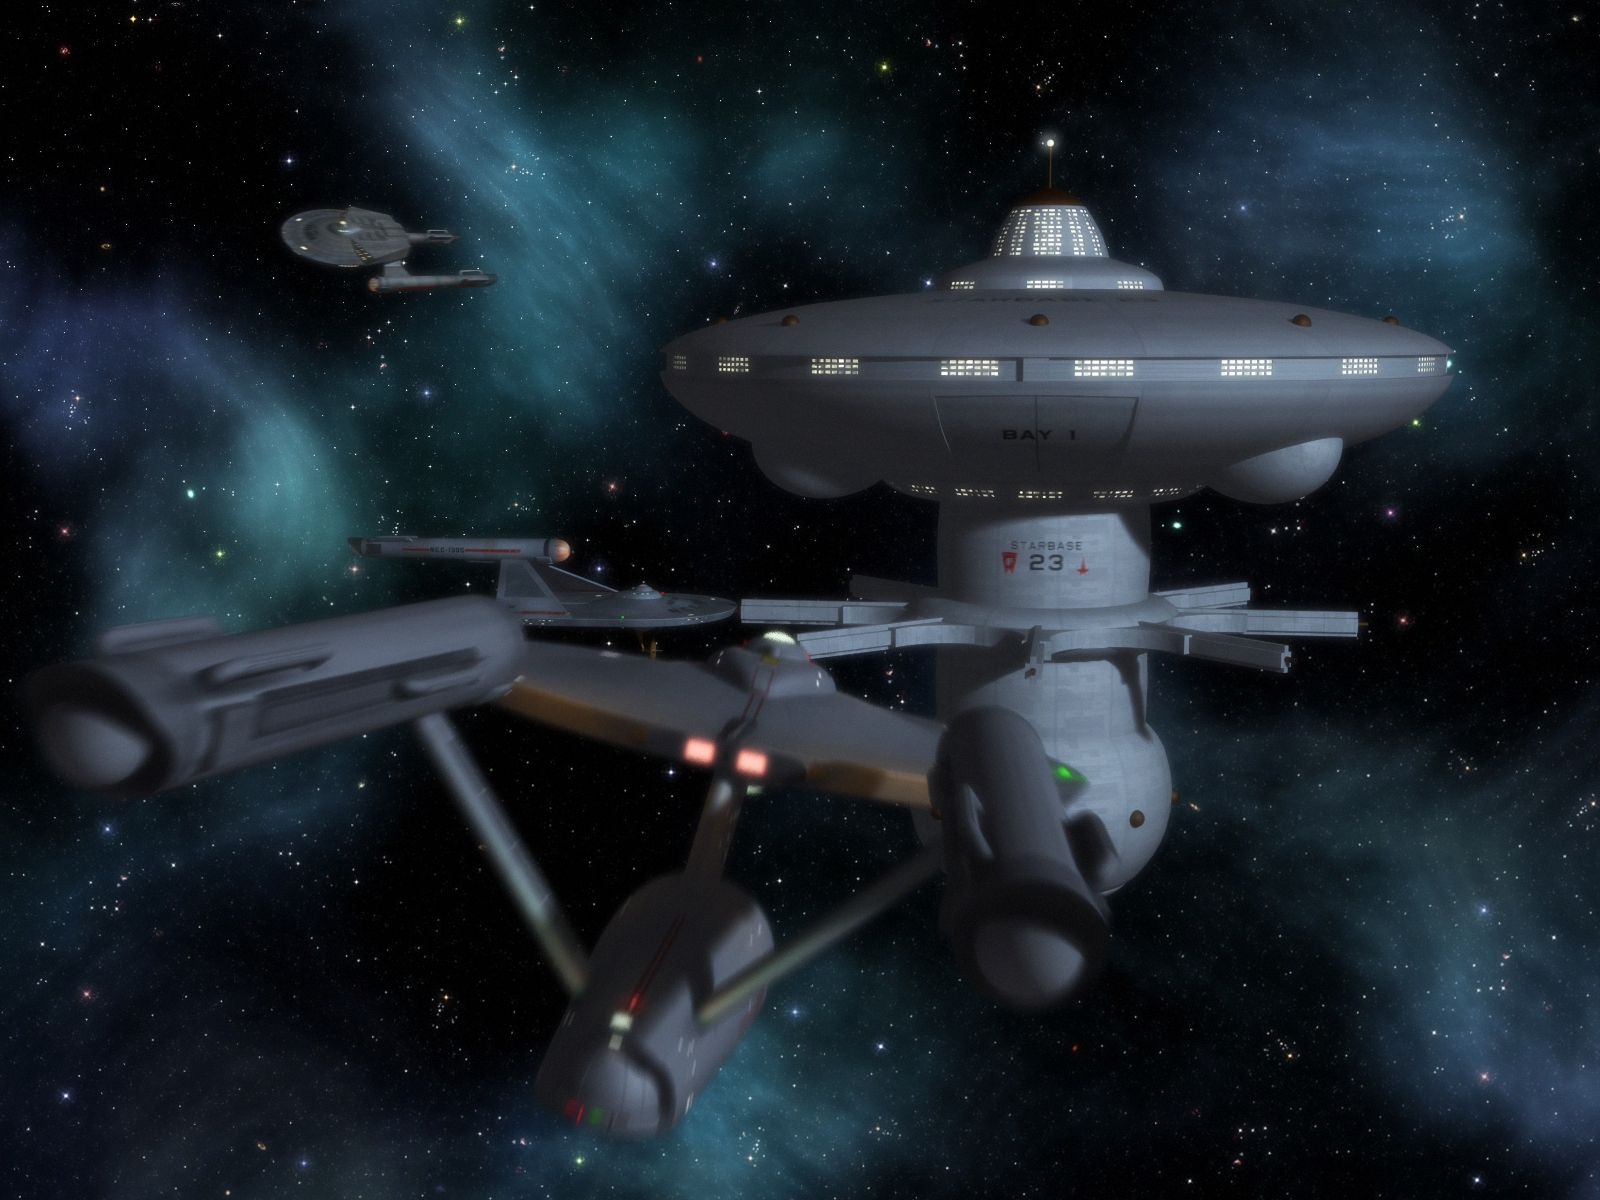 Starbase 23 by davemetlesits